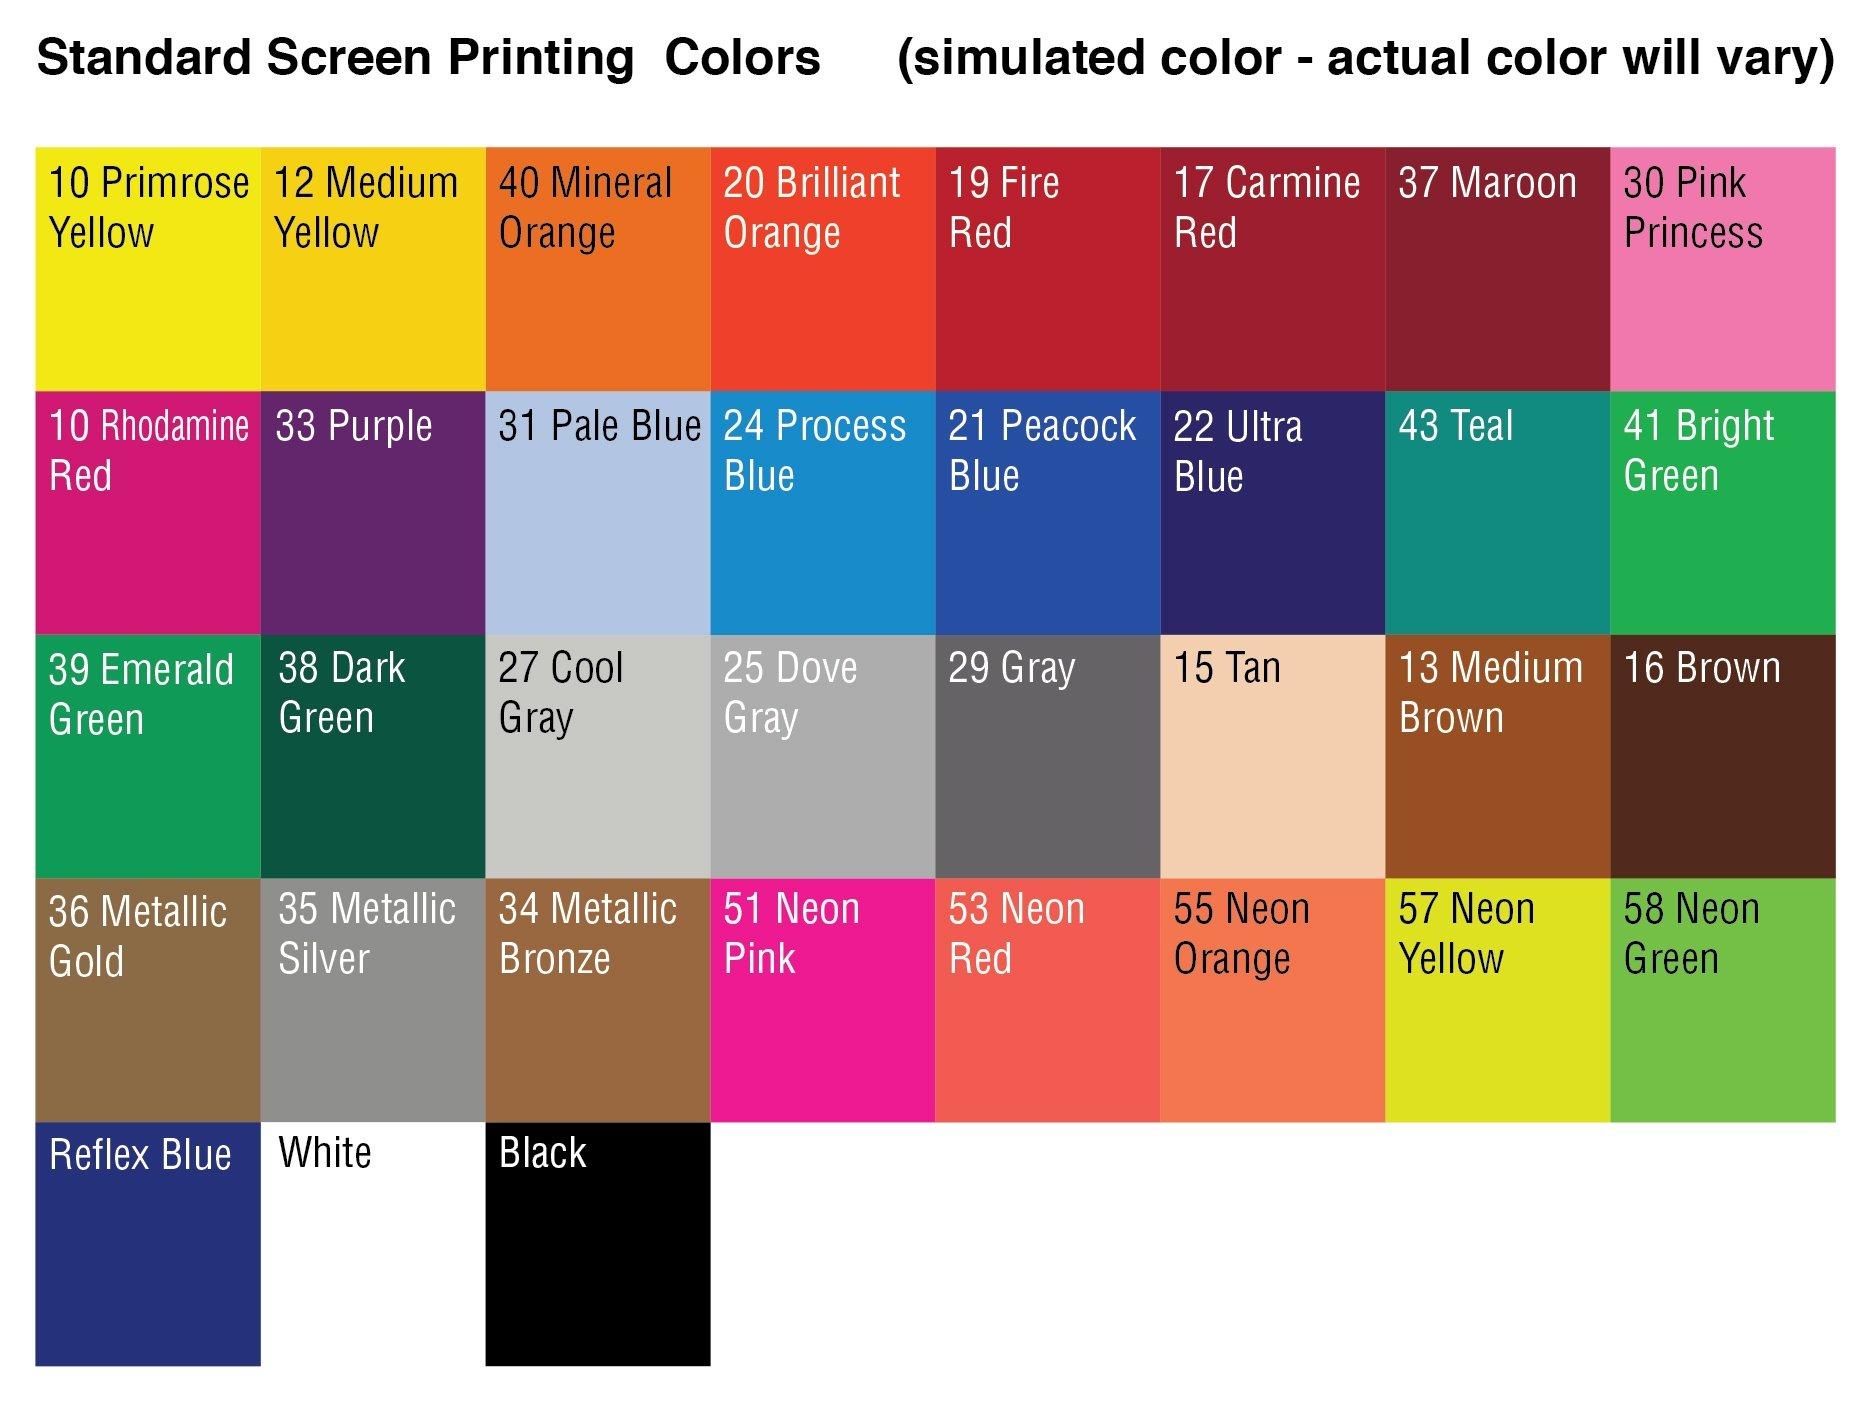 silk-screen-printing-colors-chart.jpg